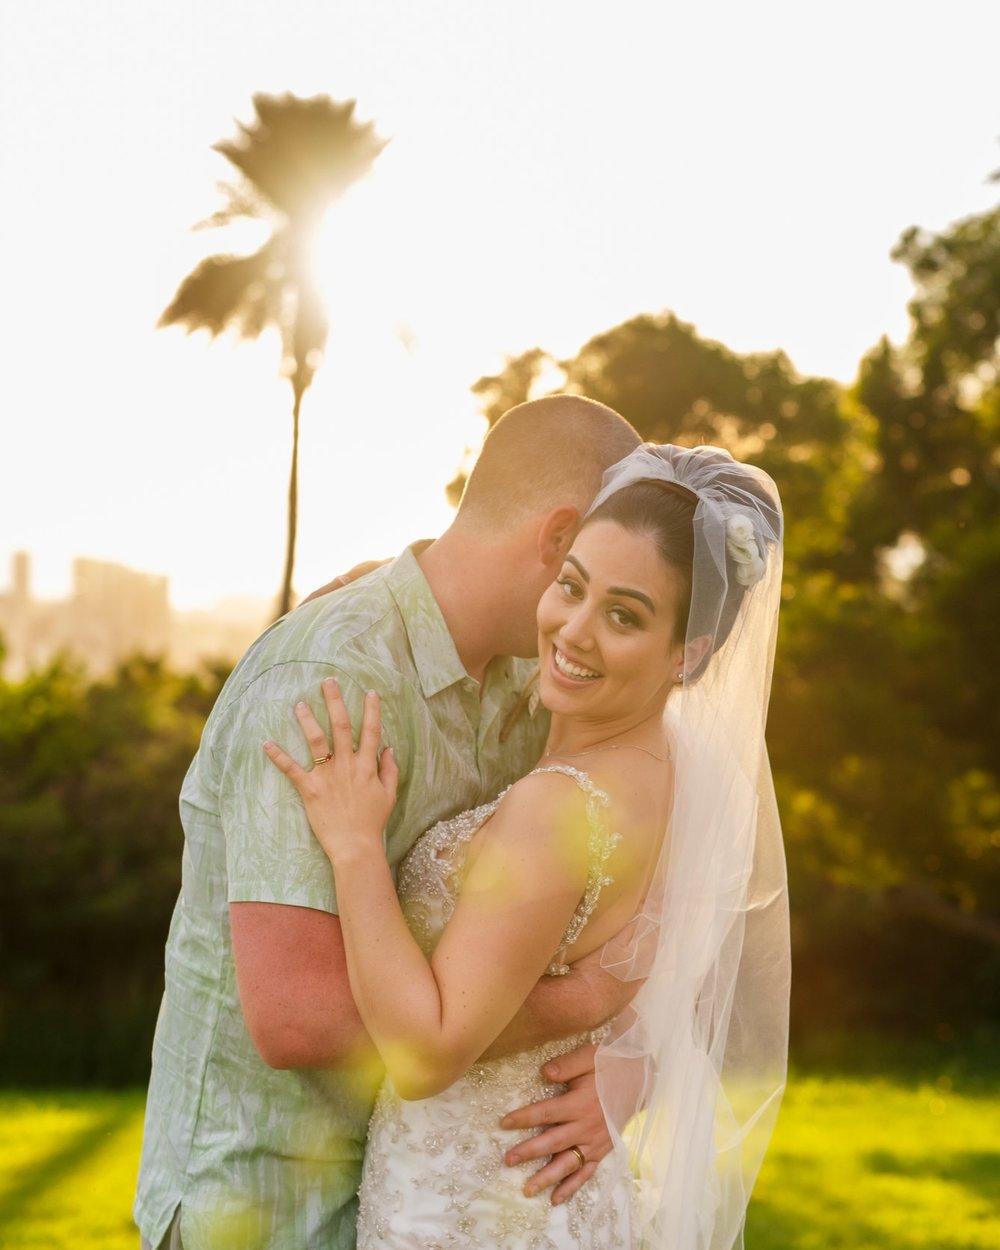 Casey & Garrett  | Nutridge Estate, Honolulu | February 2018 |  Tomas Demenis Photography